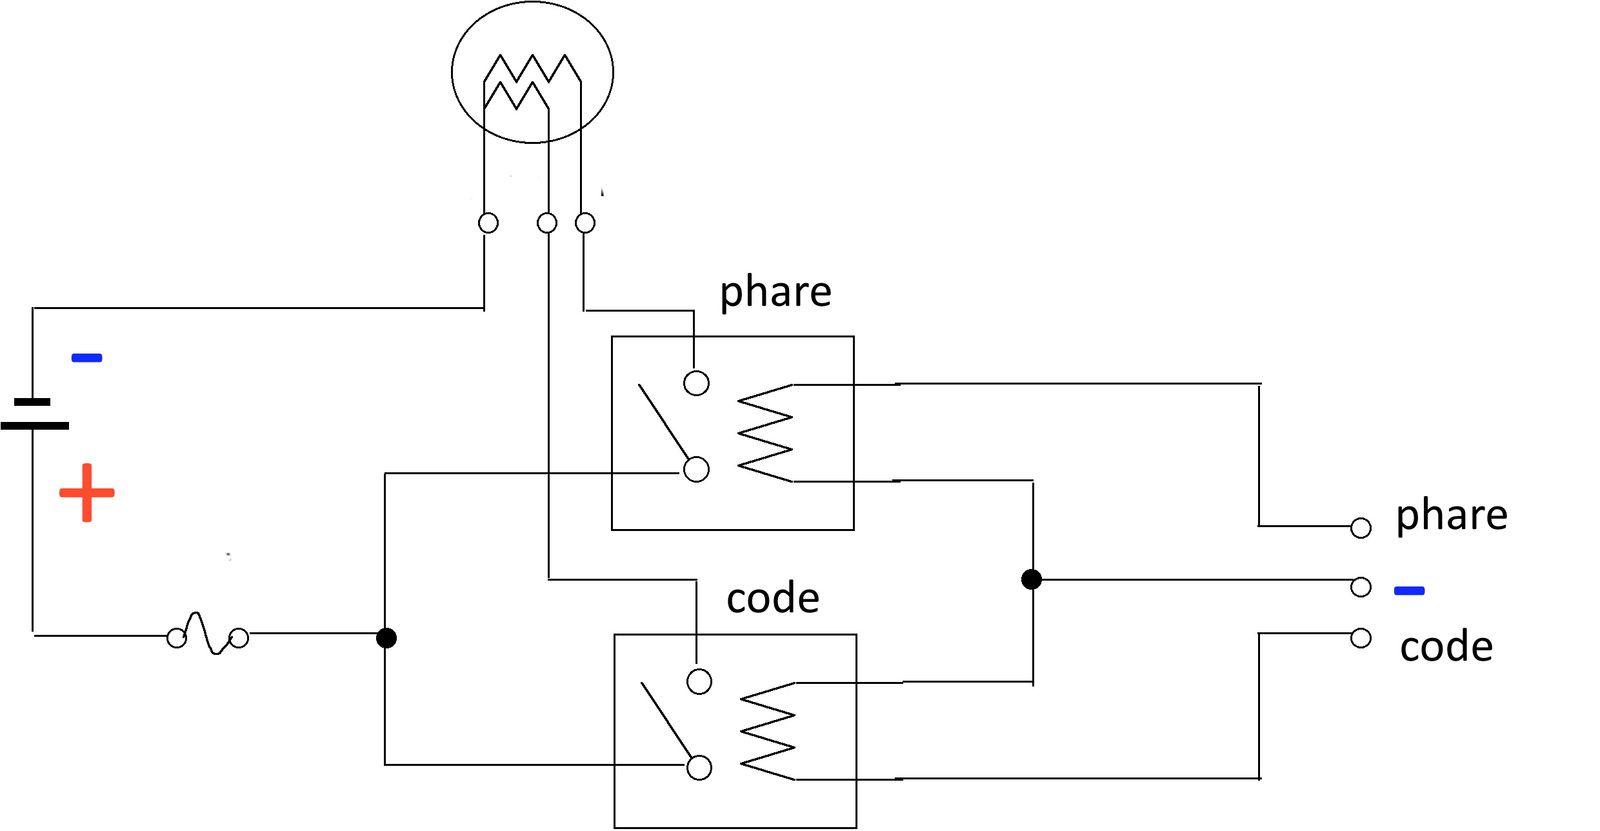 Amplificateur de phare